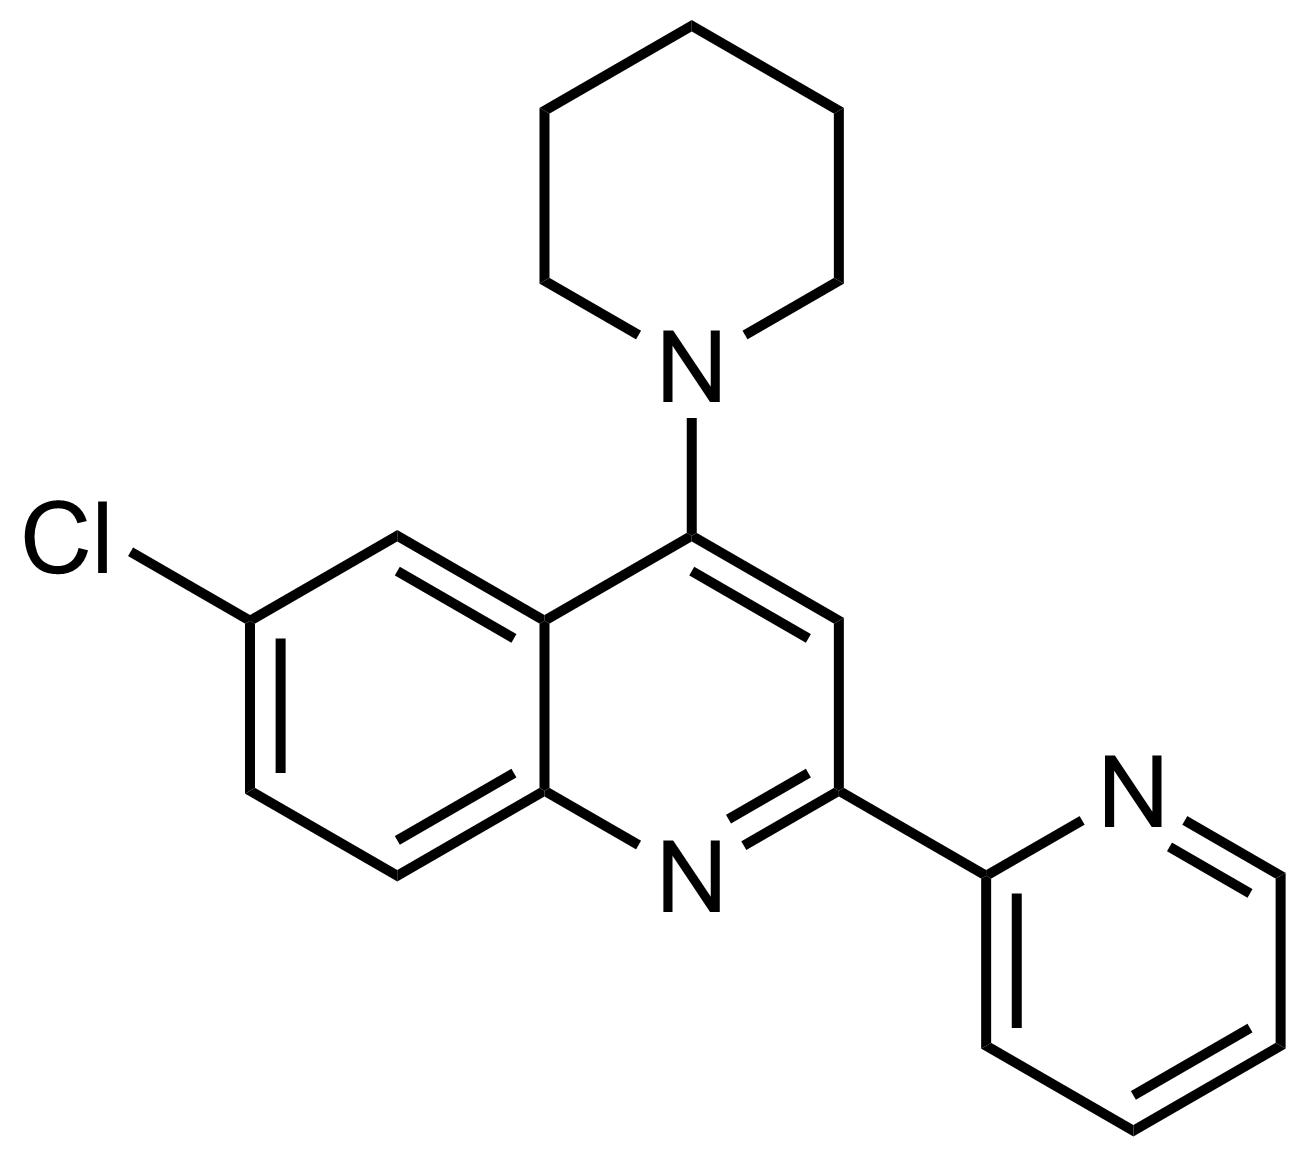 Structure of 6-Chloro-4-(piperidin-1-yl)-2-(pyridin-2-yl)quinoline